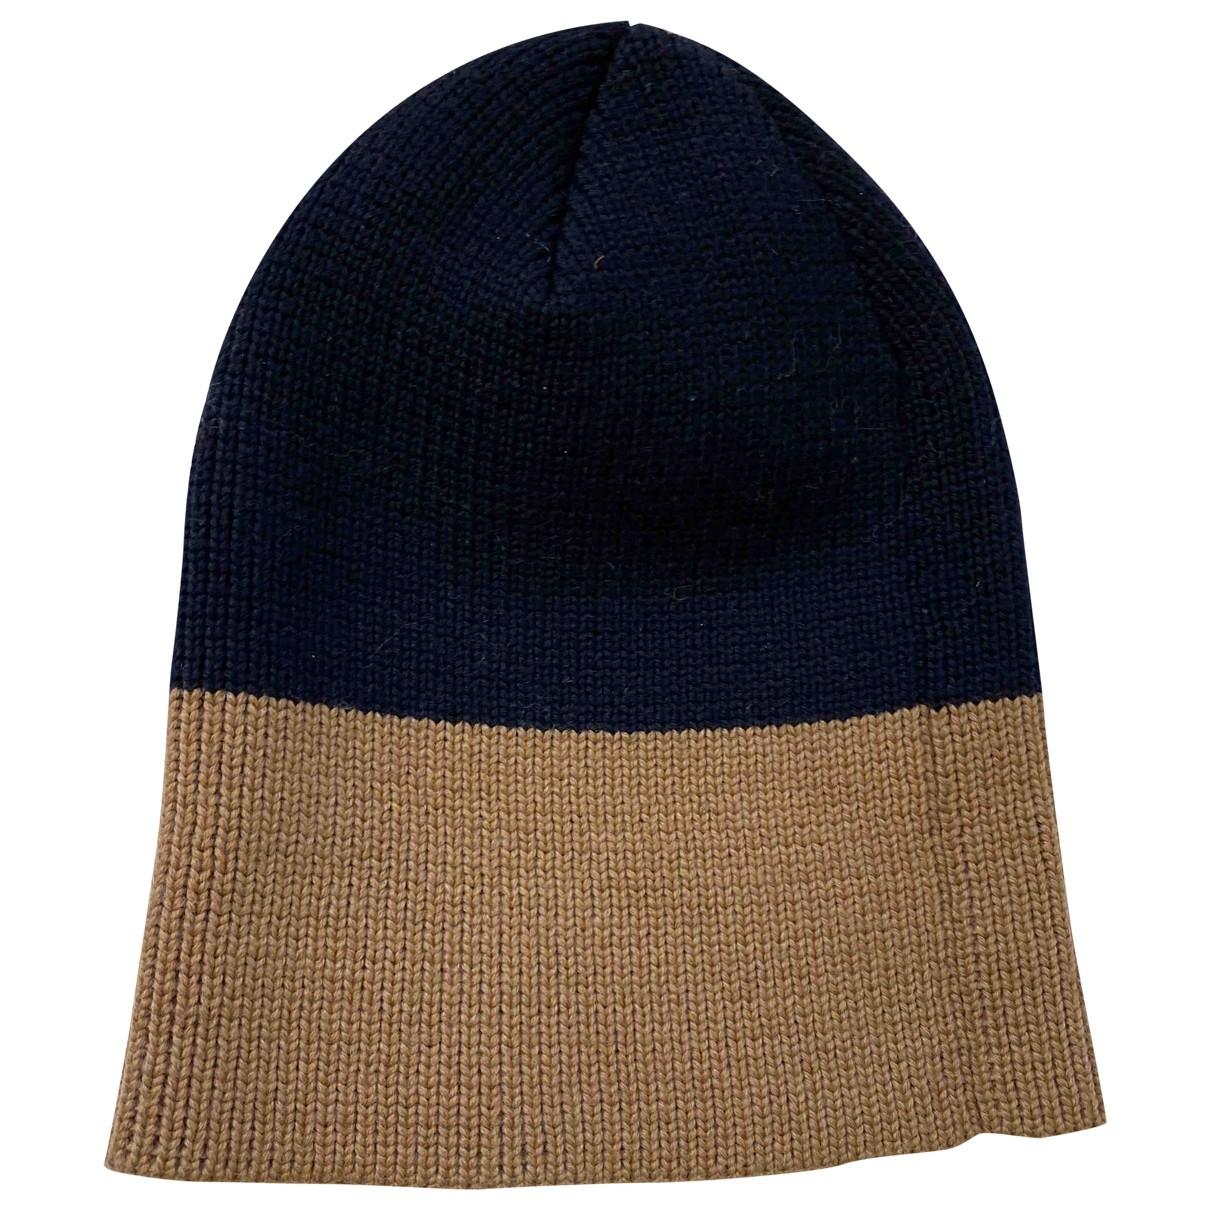 Marni \N Multicolour Wool hat & pull on hat for Men M International